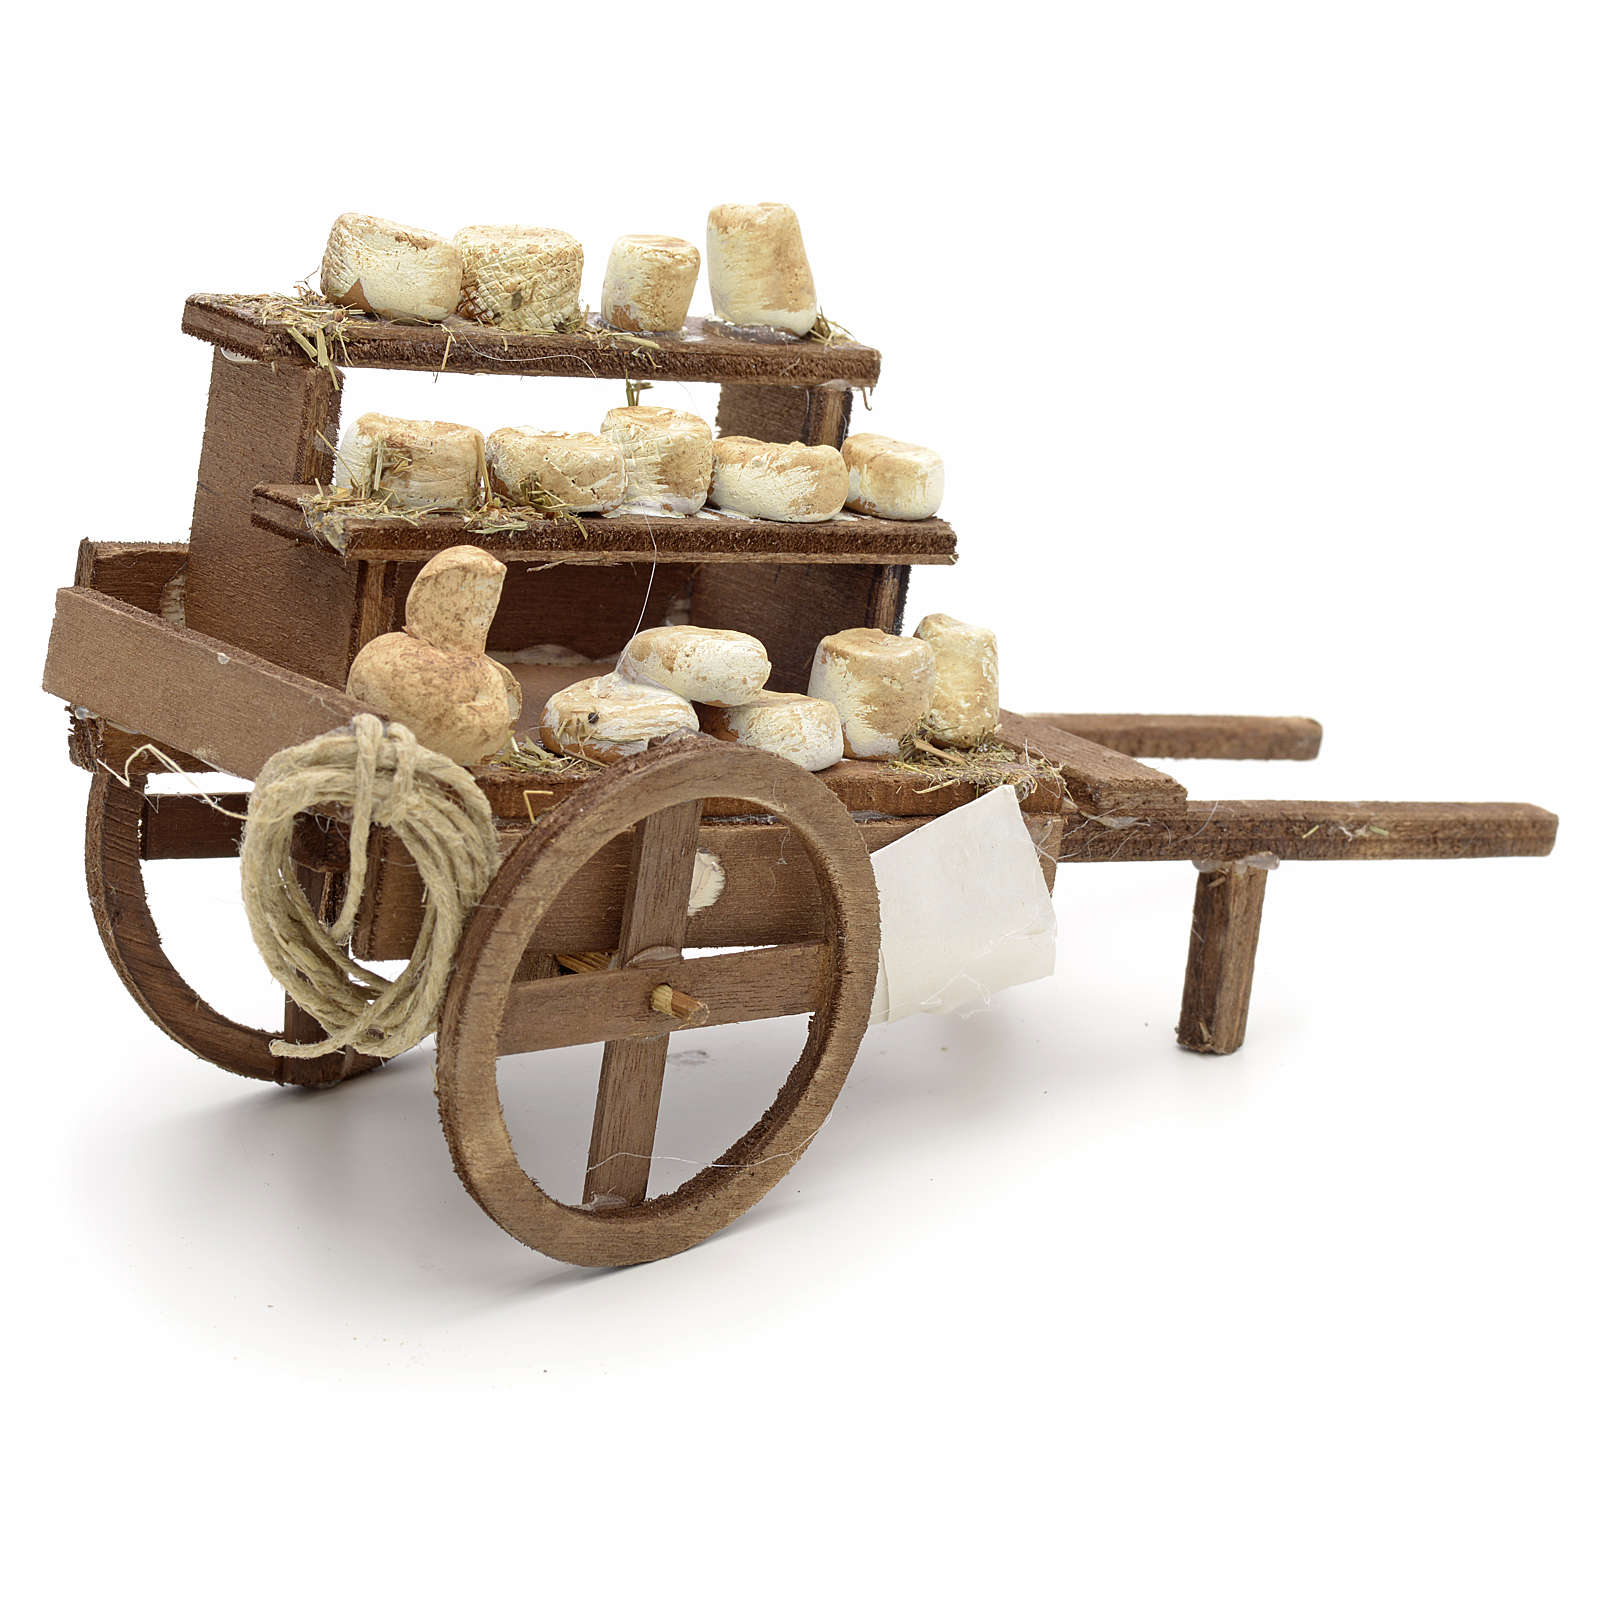 Neapolitan Nativity scene accessory, cheese cart 4